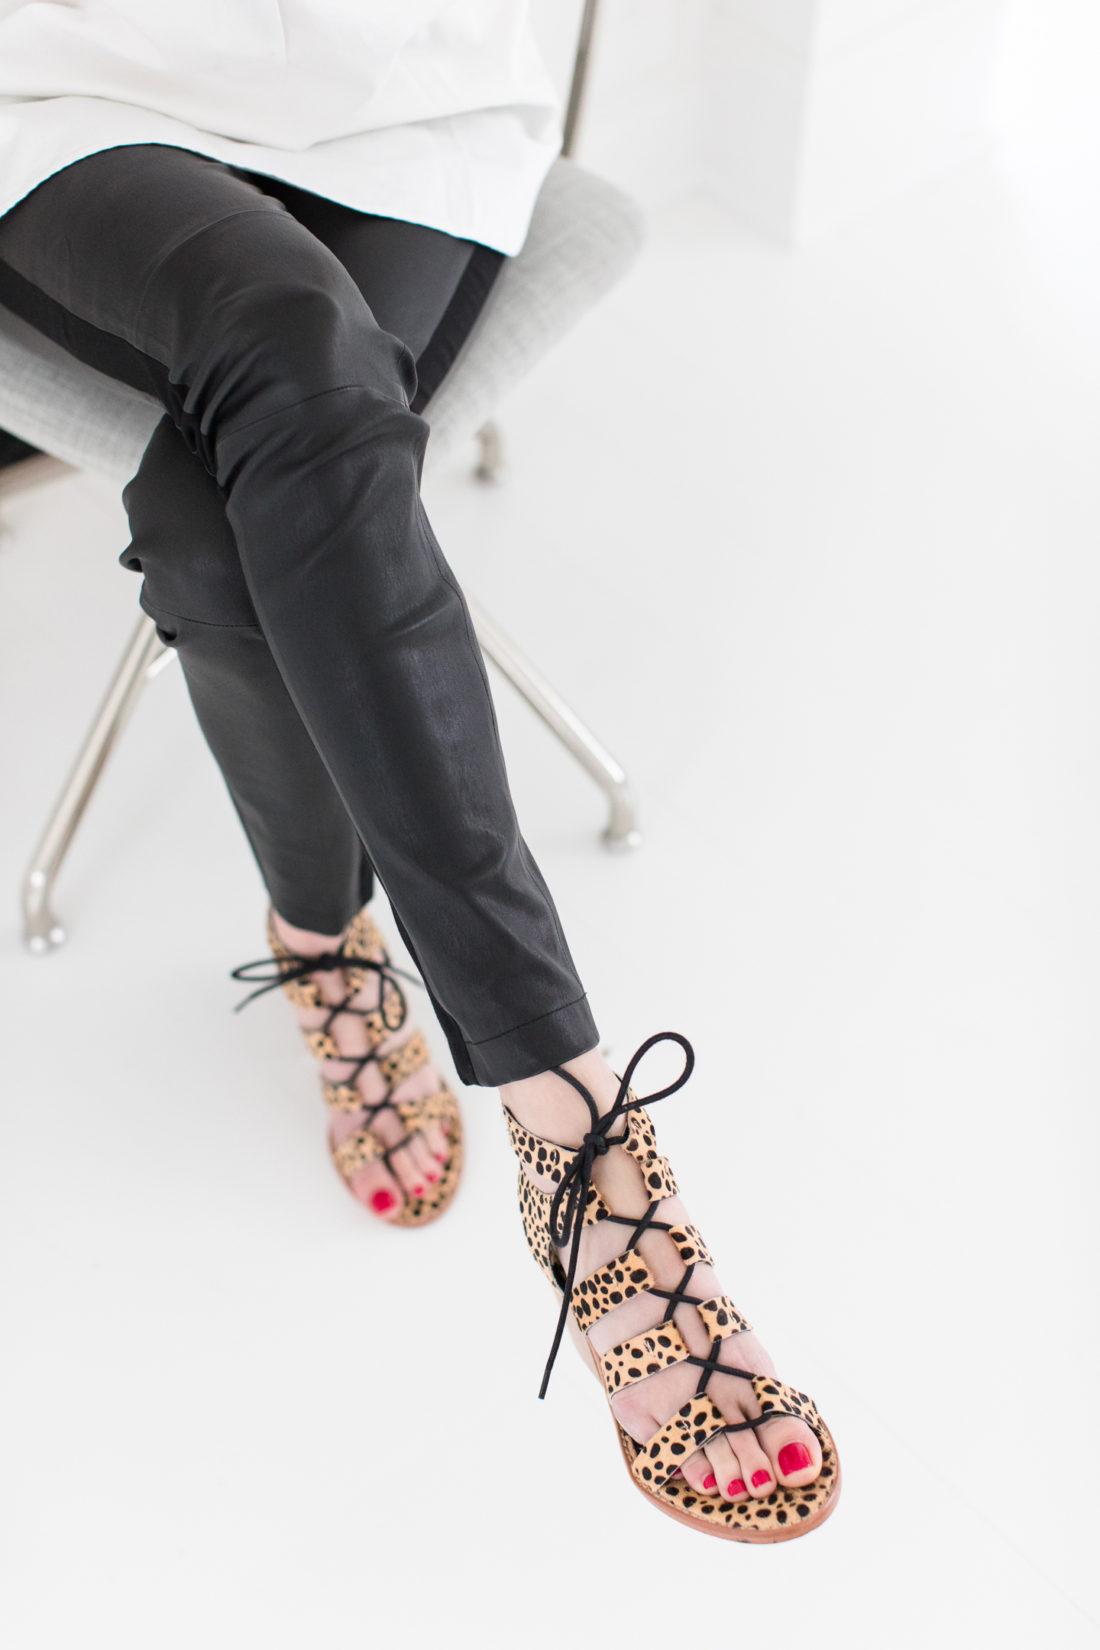 Eva Amurri Martino wears a pair of Sol Sana leopard sandals with black leather leggings